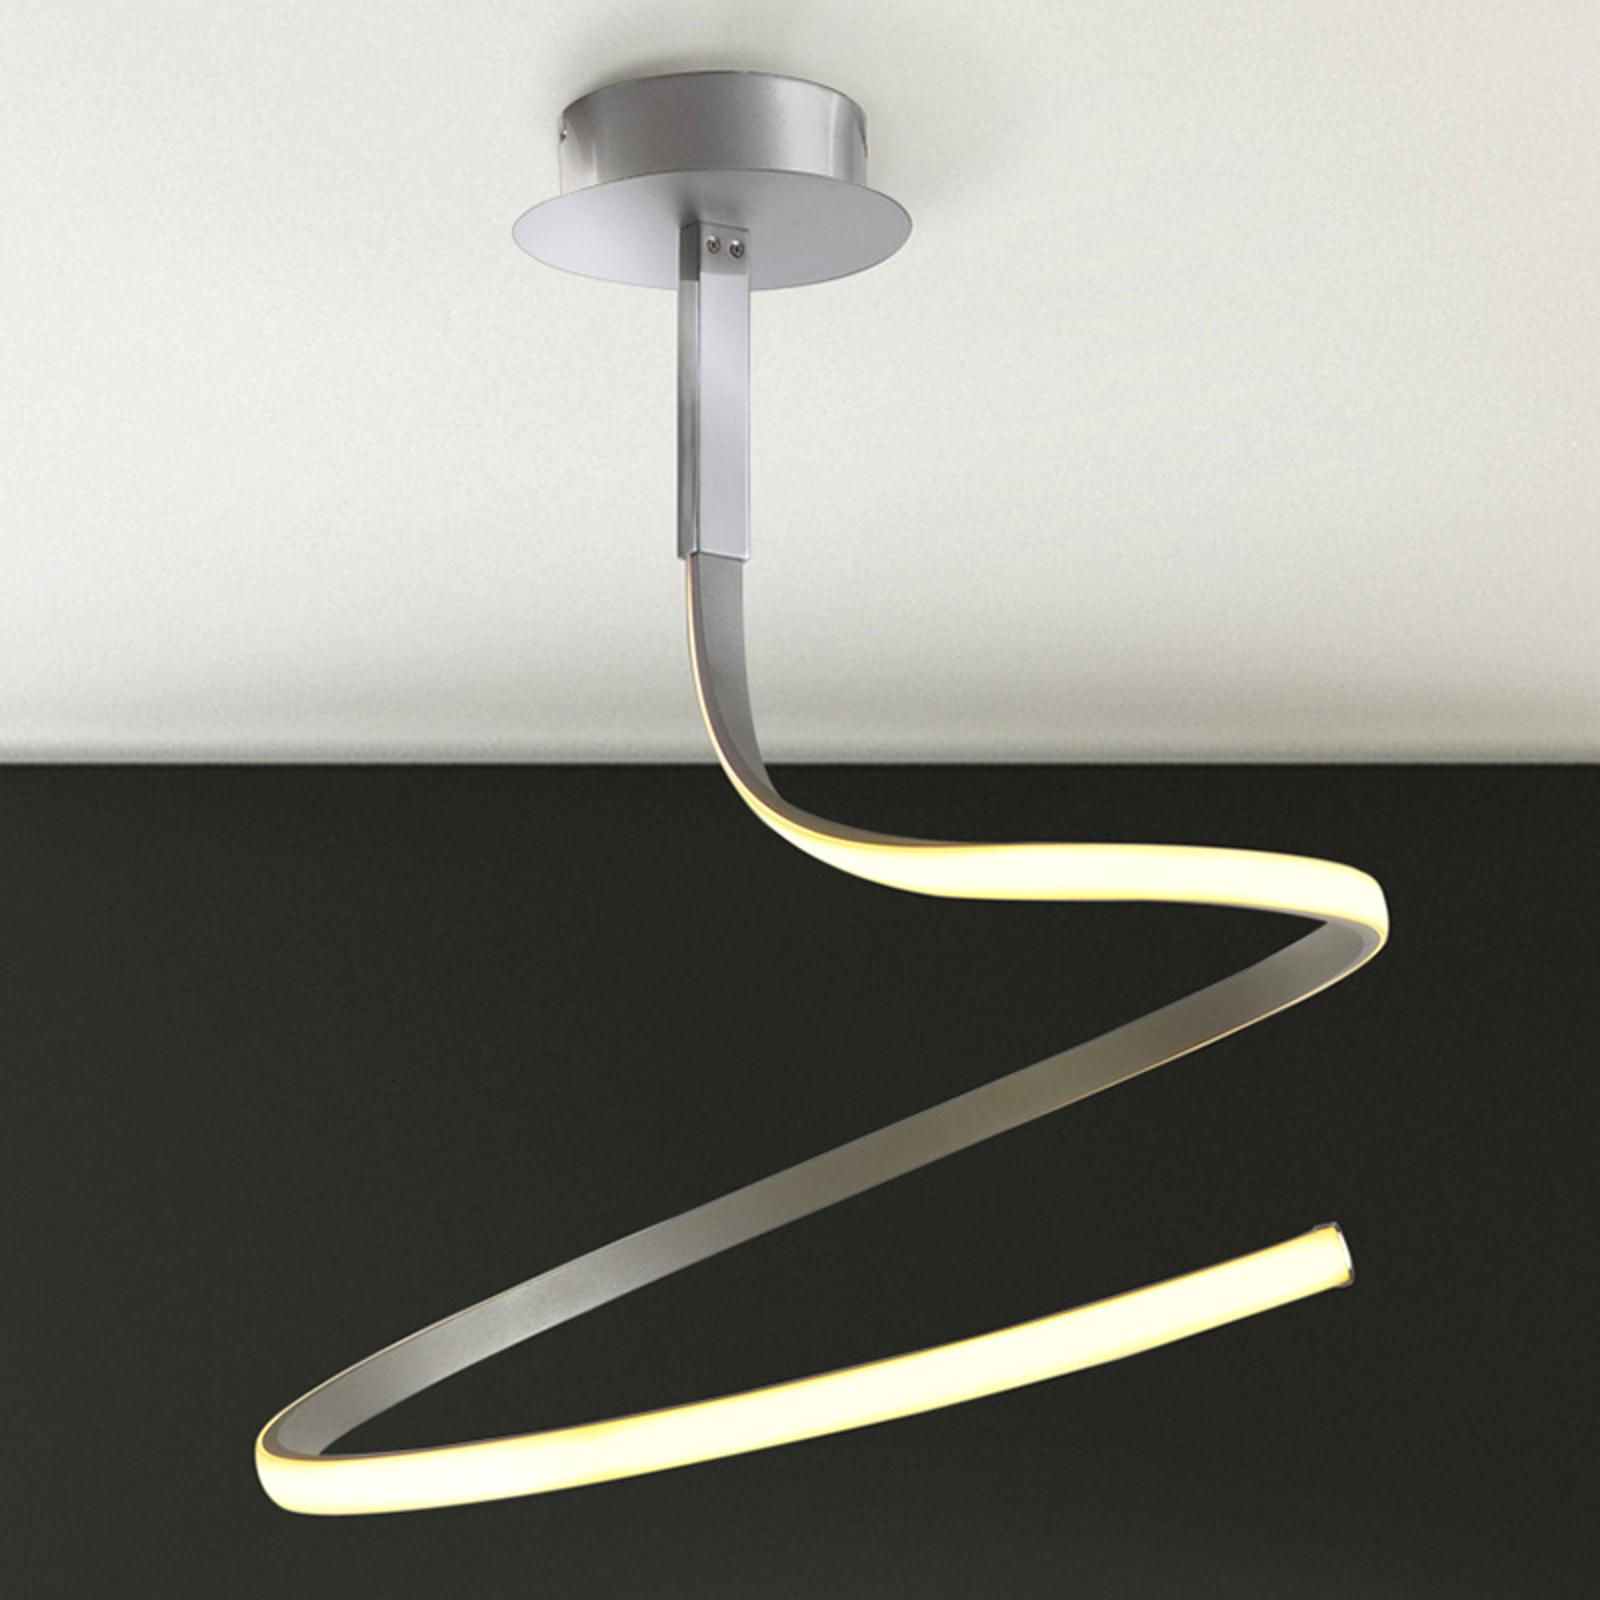 Lampada a sospensione LED Nur 30 W